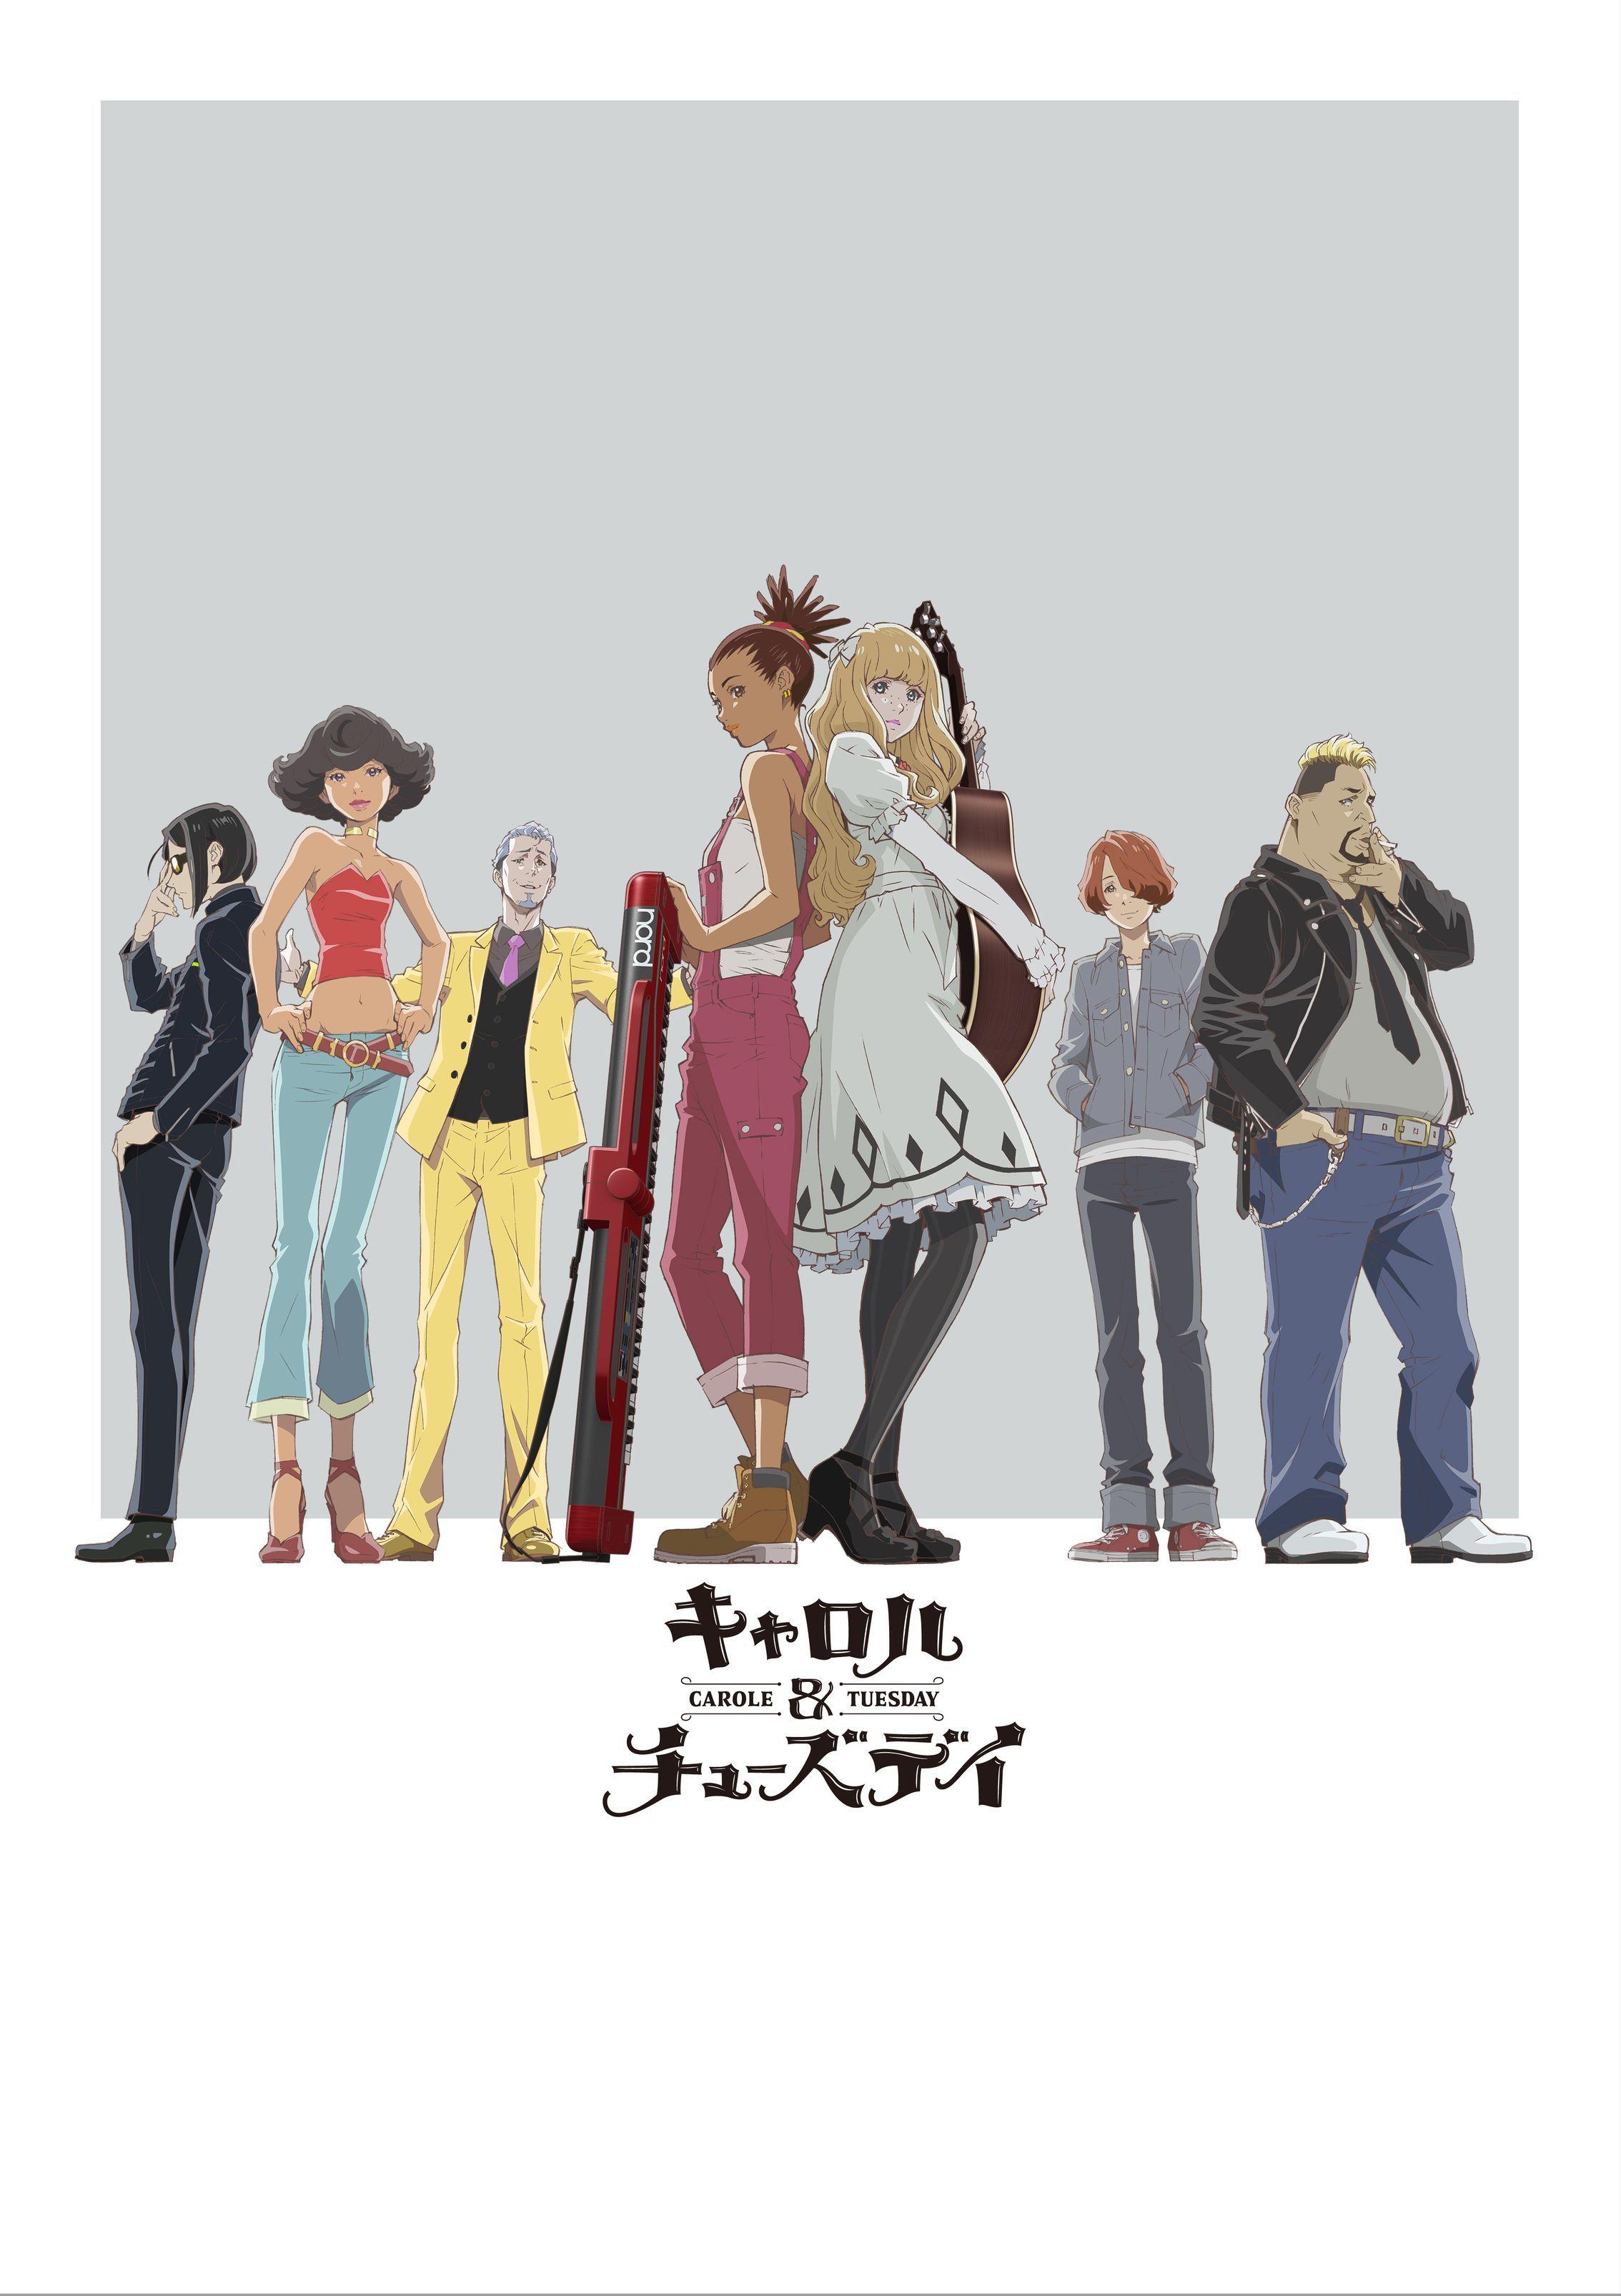 TVアニメ『キャロル&チューズデイ』 (c)ボンズ・渡辺信一郎/キャロル&チューズデイ製作委員会